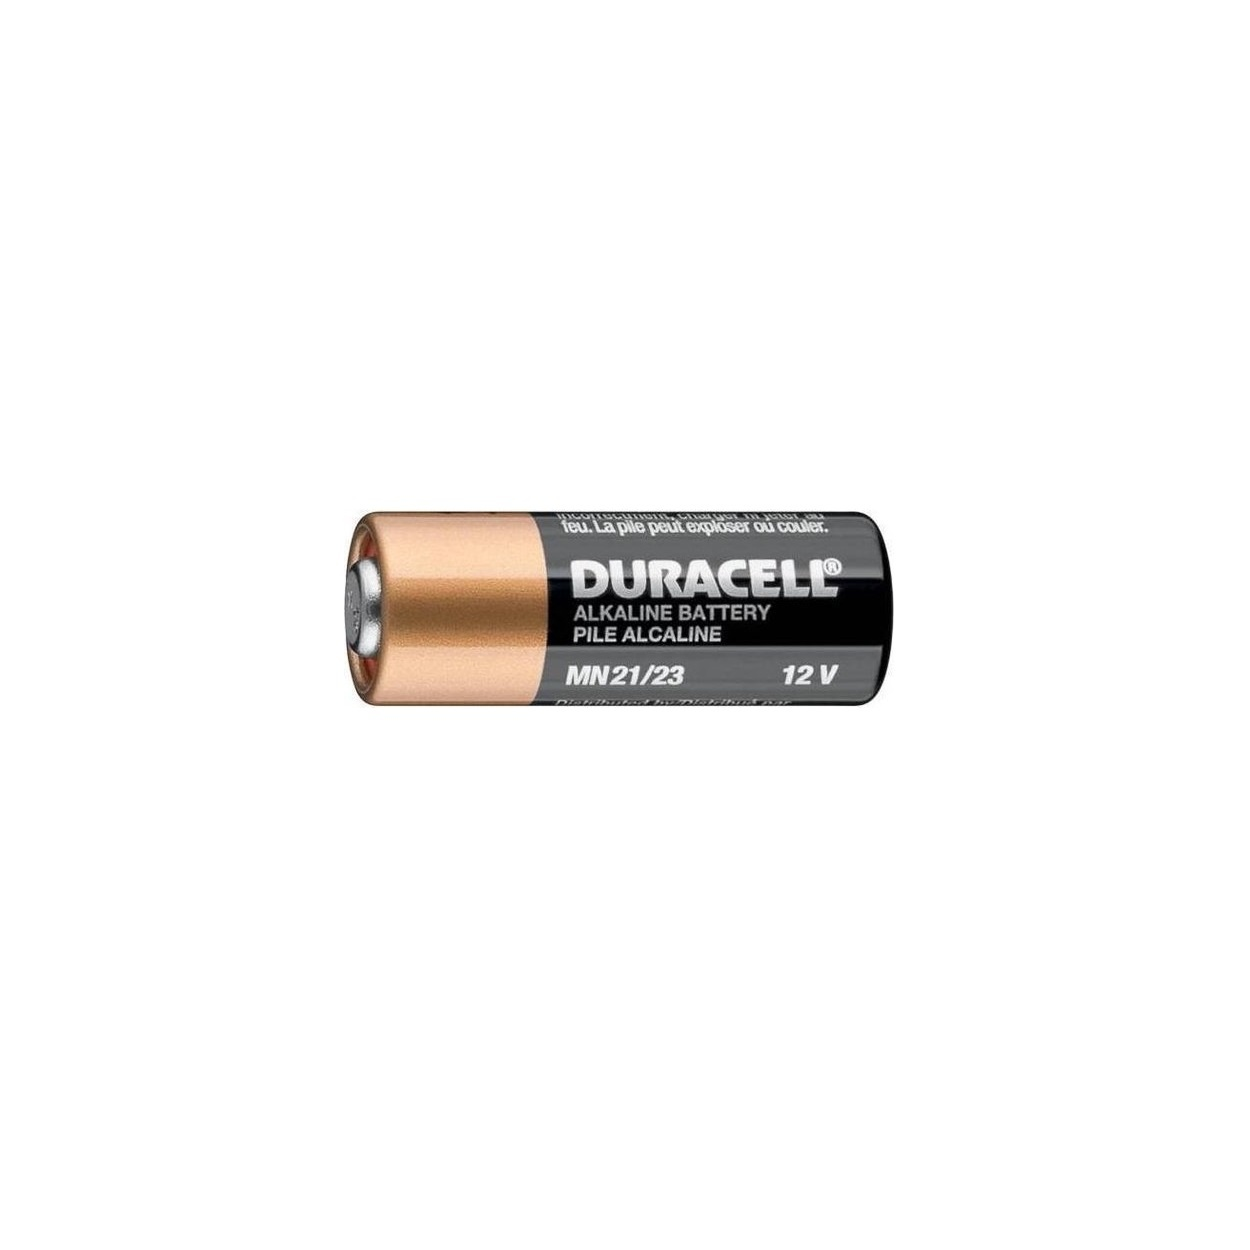 Duracell 12 Volt MN21 alkaline batterij